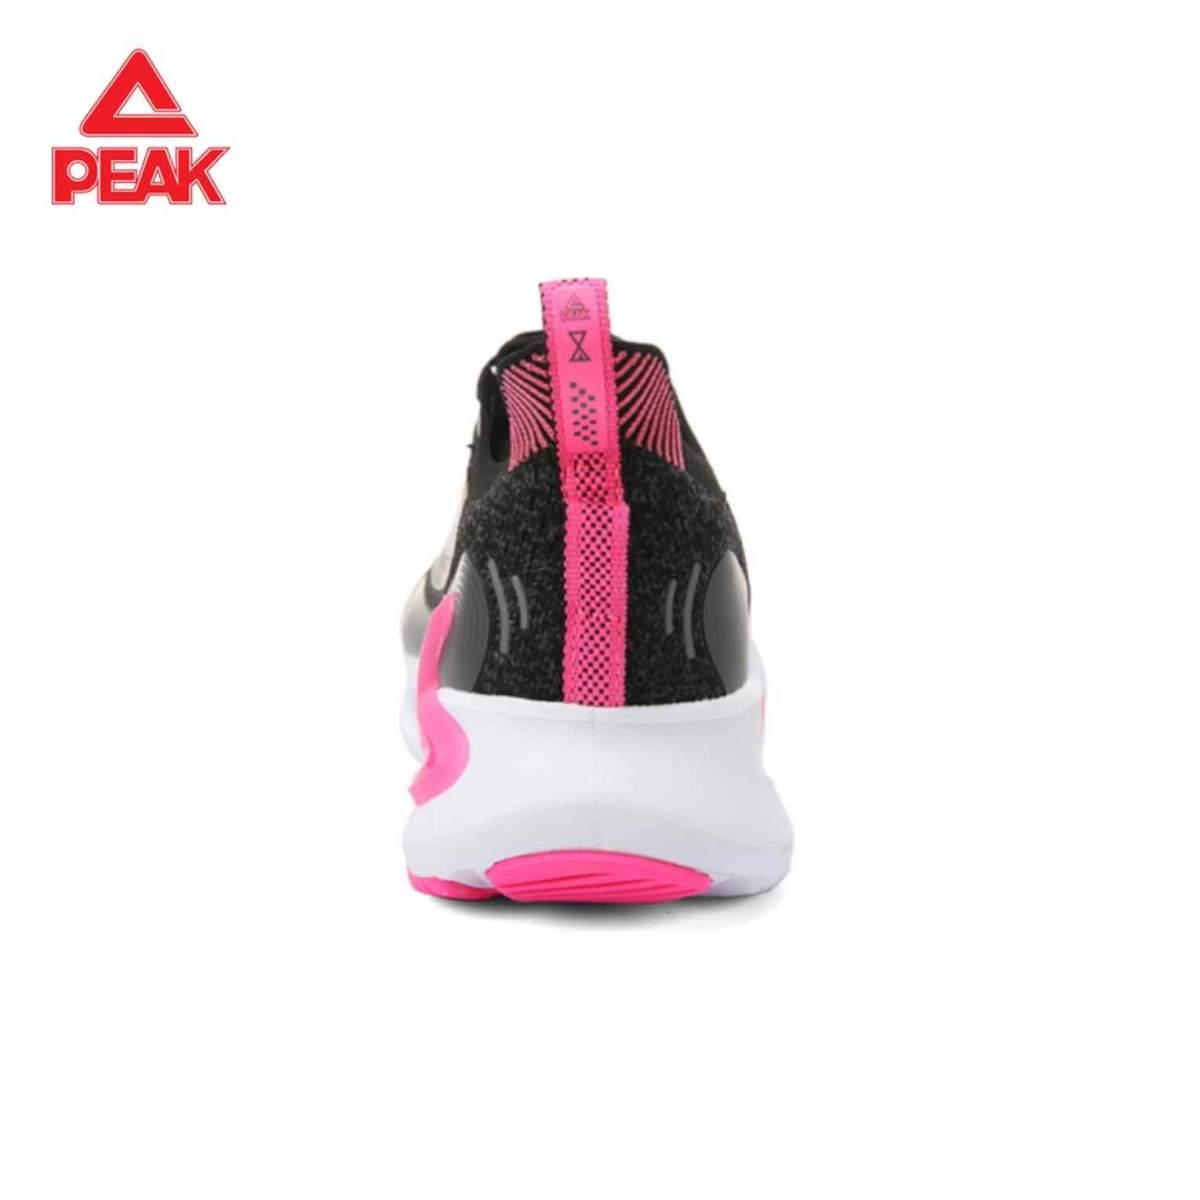 Peak-Shoes-EW02168H-pink-3